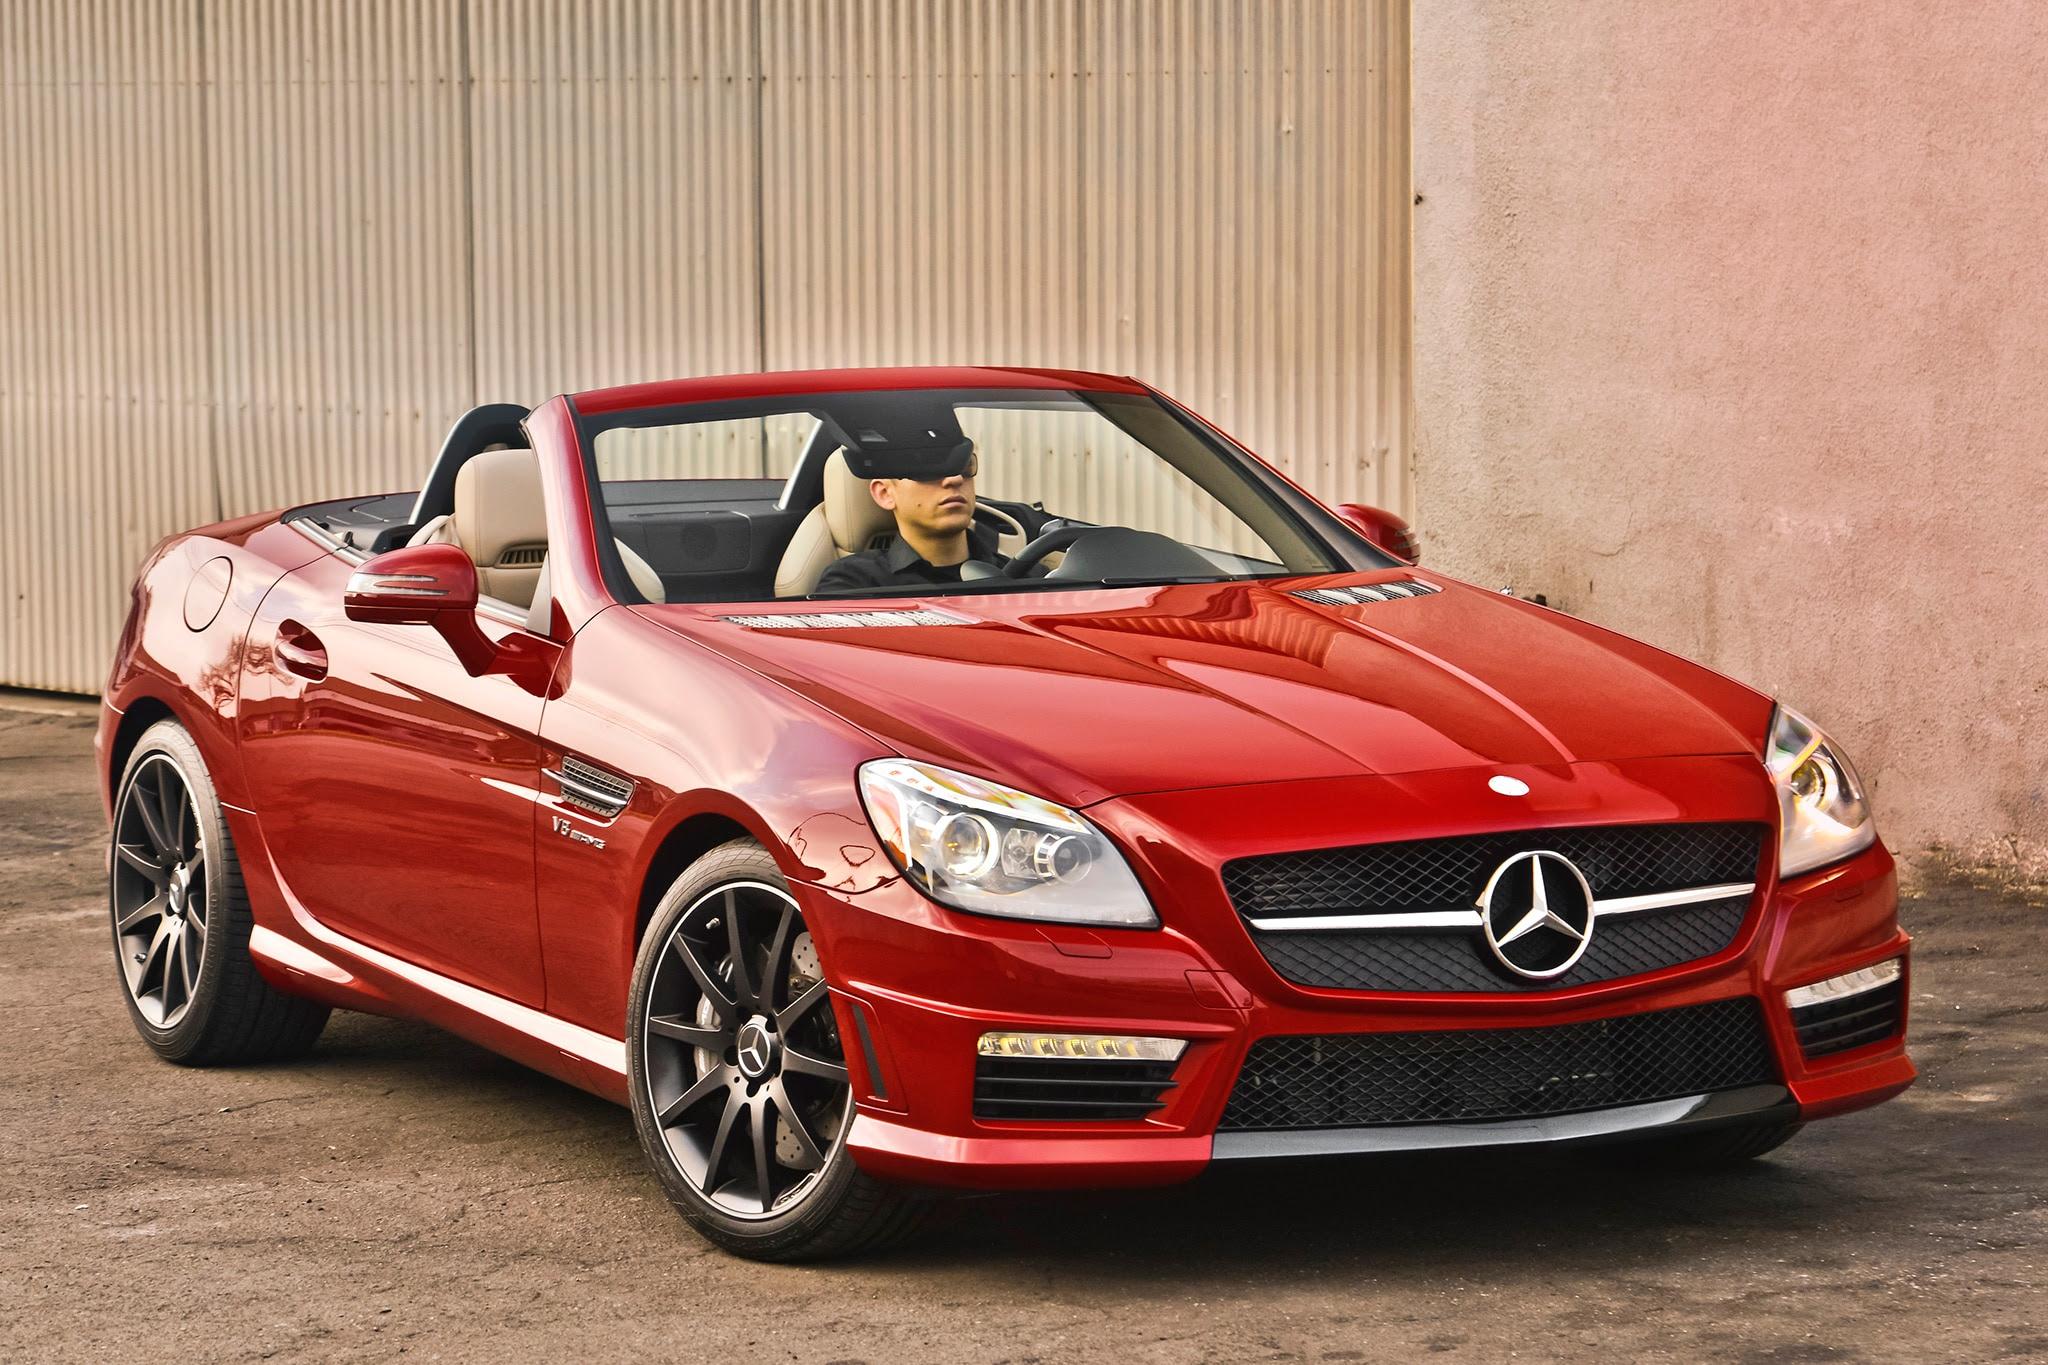 2016 Mercedes-Benz SLK Updated with New Engine